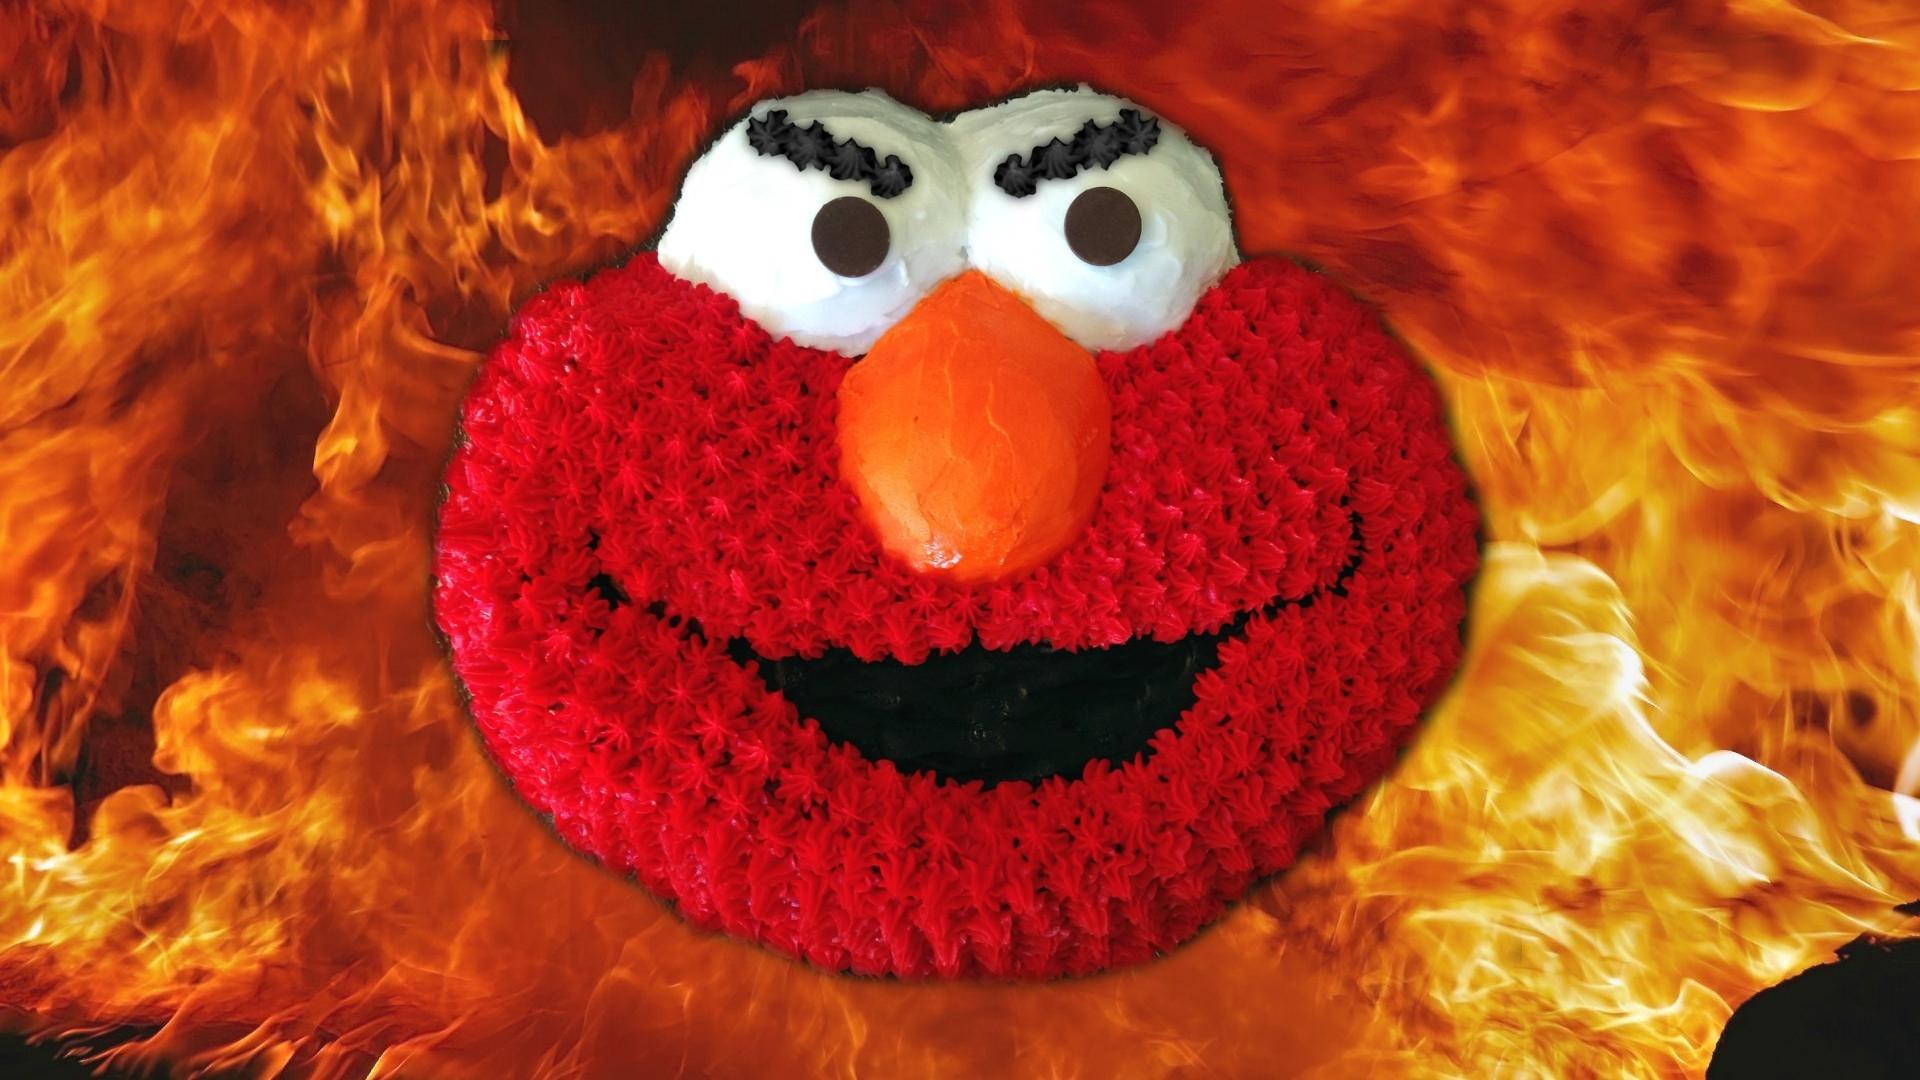 Elmo hd wallpaper download